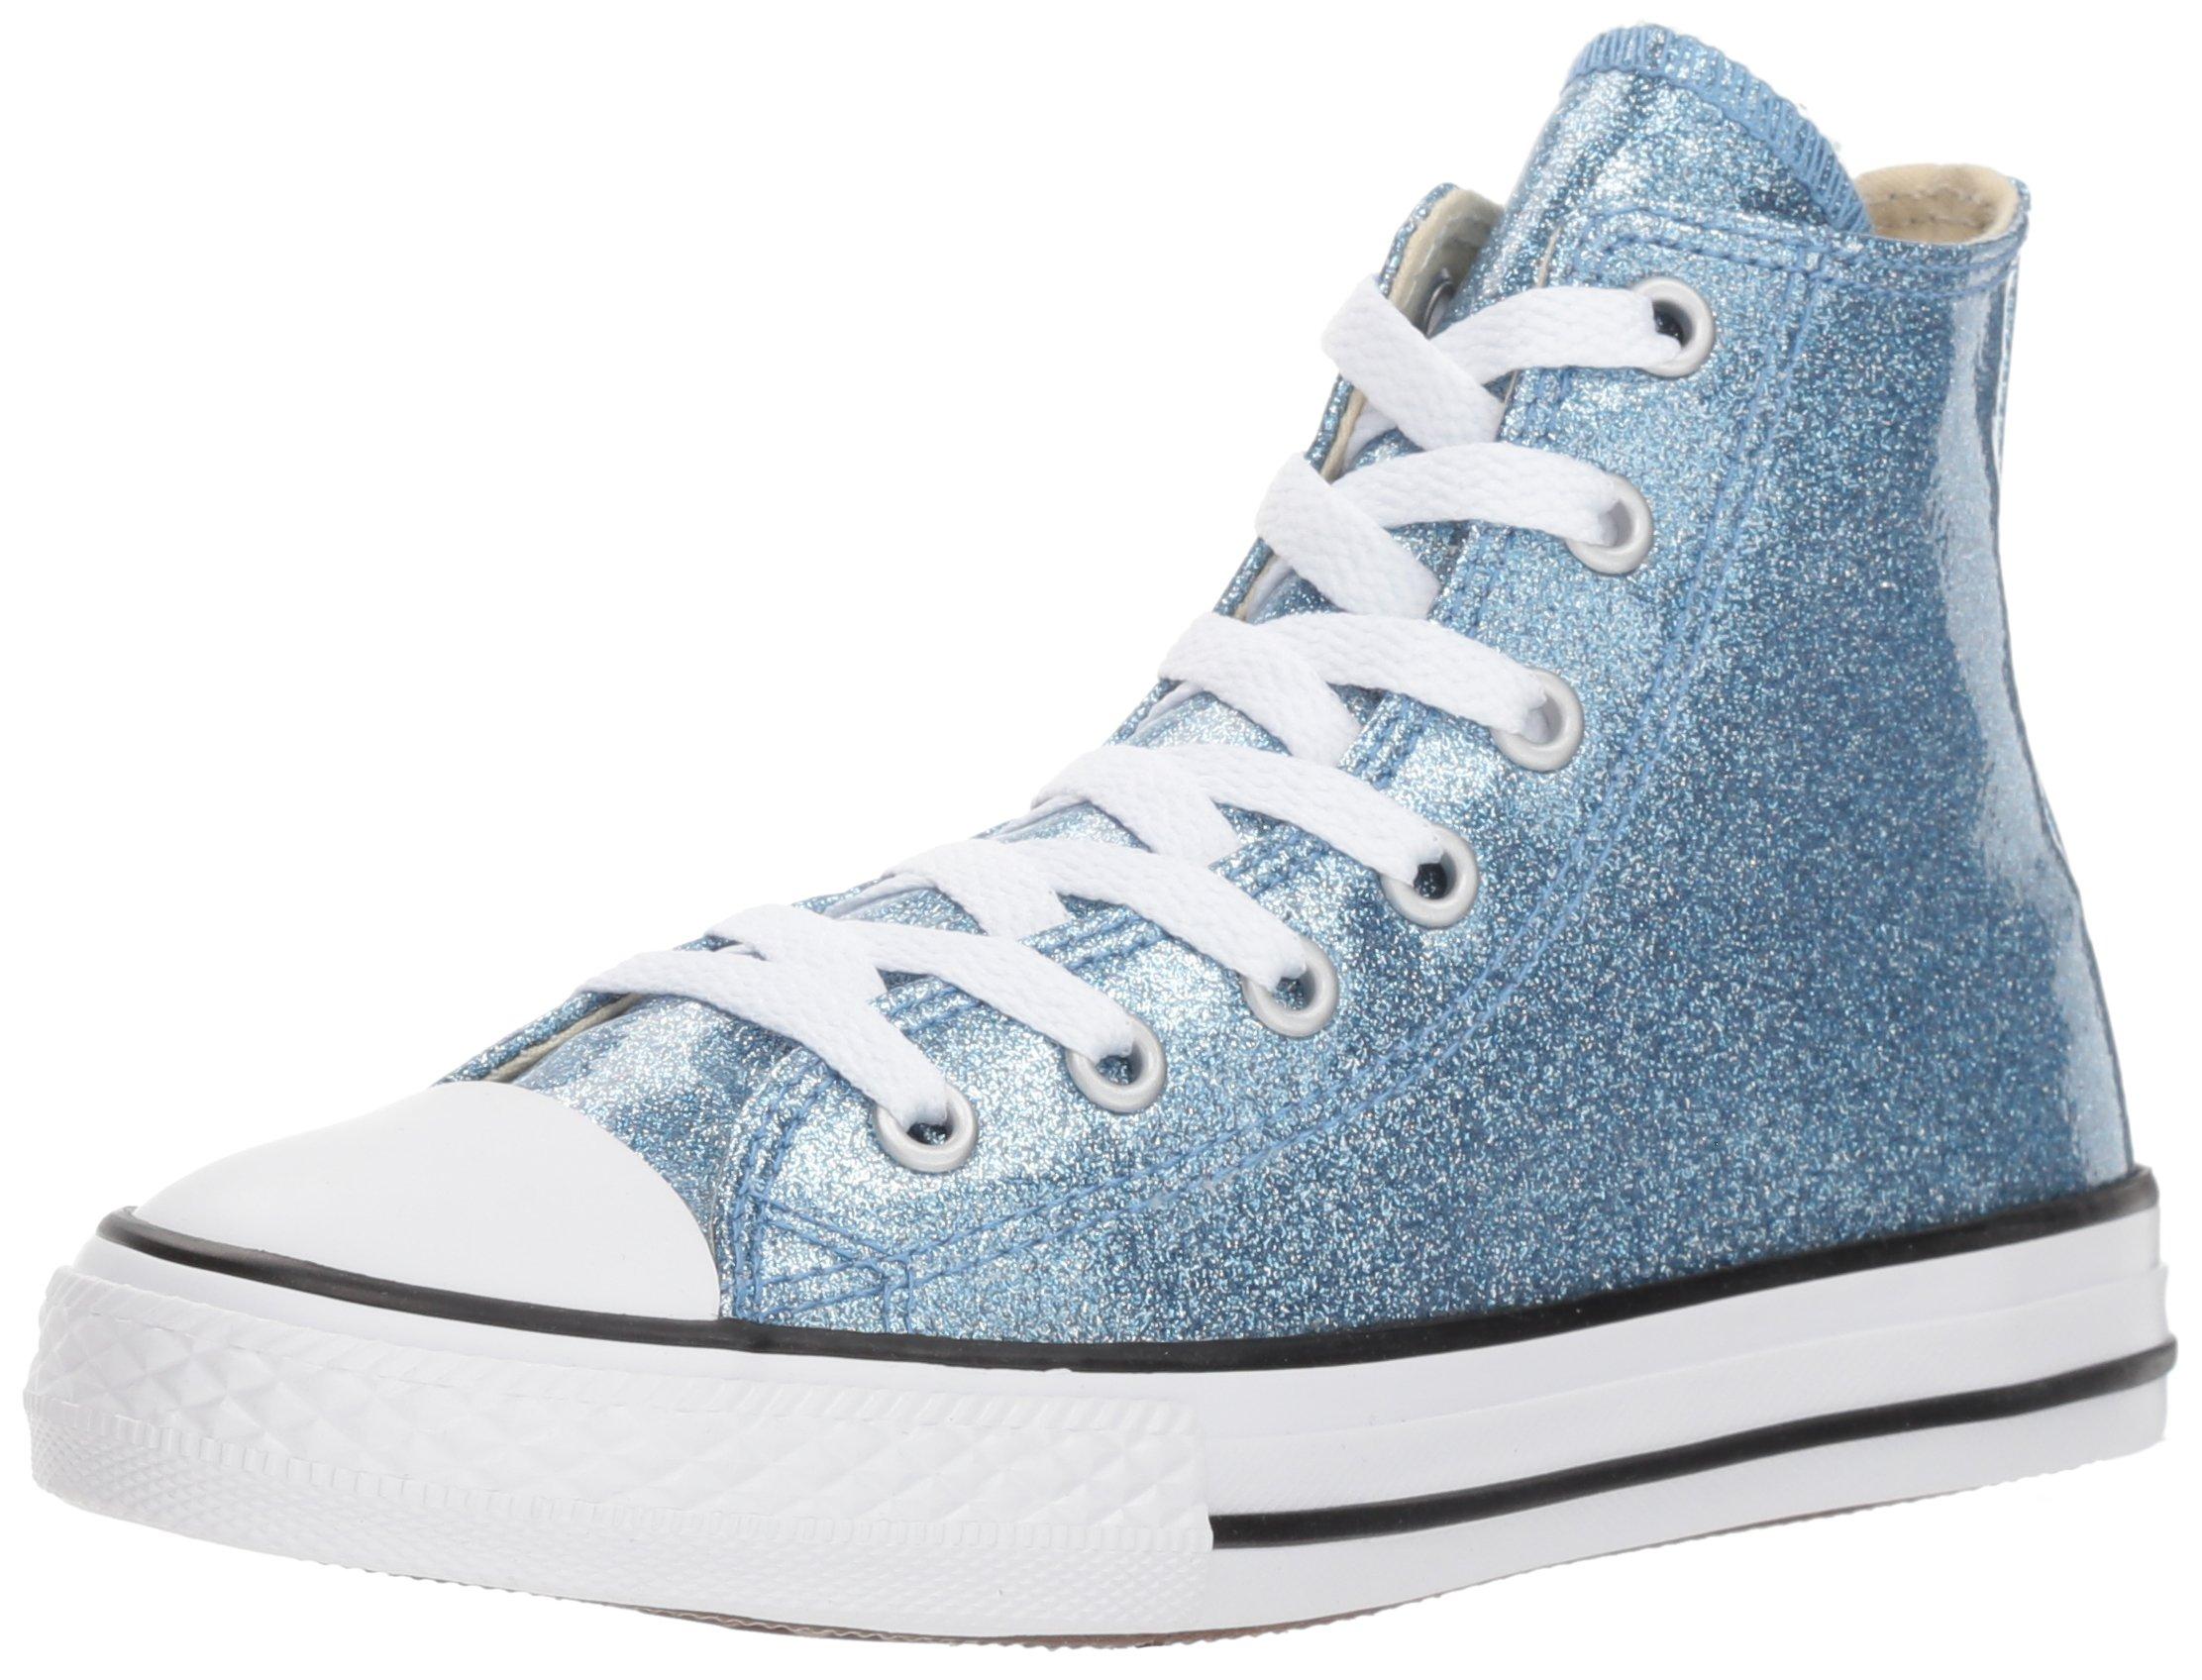 Converse Girls' Chuck Taylor All Star Glitter High Top Sneaker, BlueSilver, 5 M US Big Kid